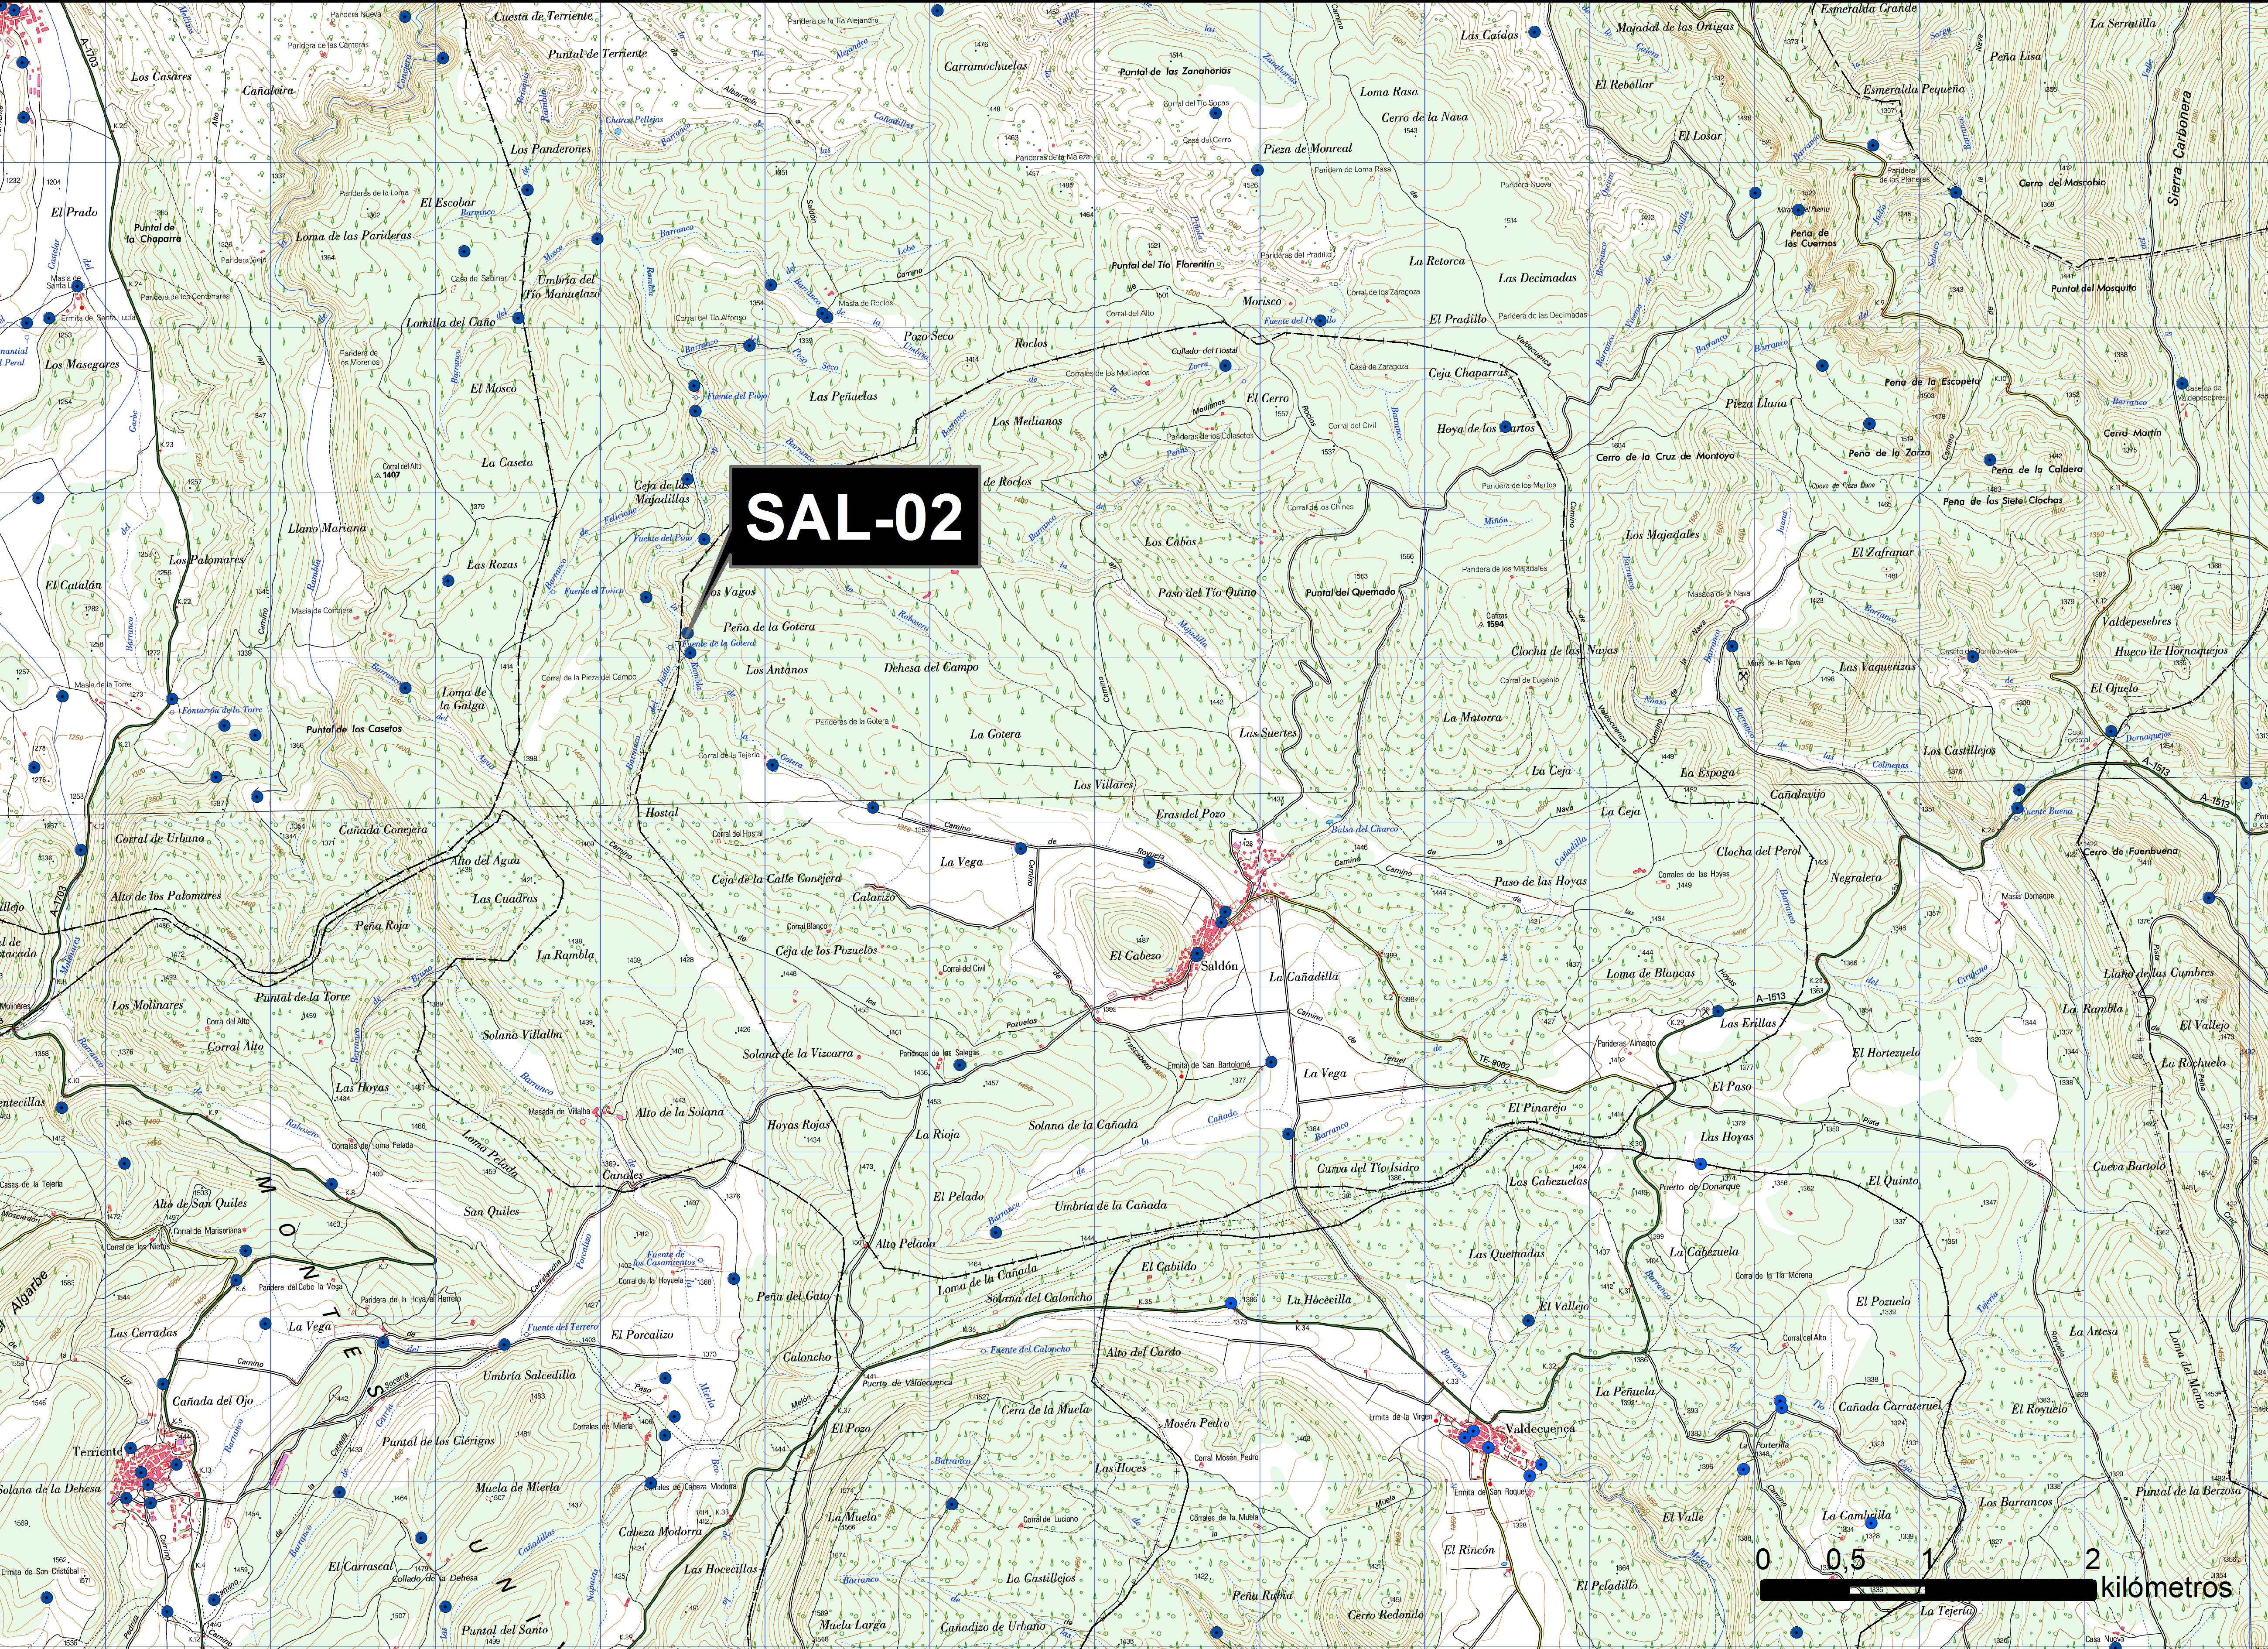 SAL_02_M.V.LOZANO_PINO_MAP.TOPO 1